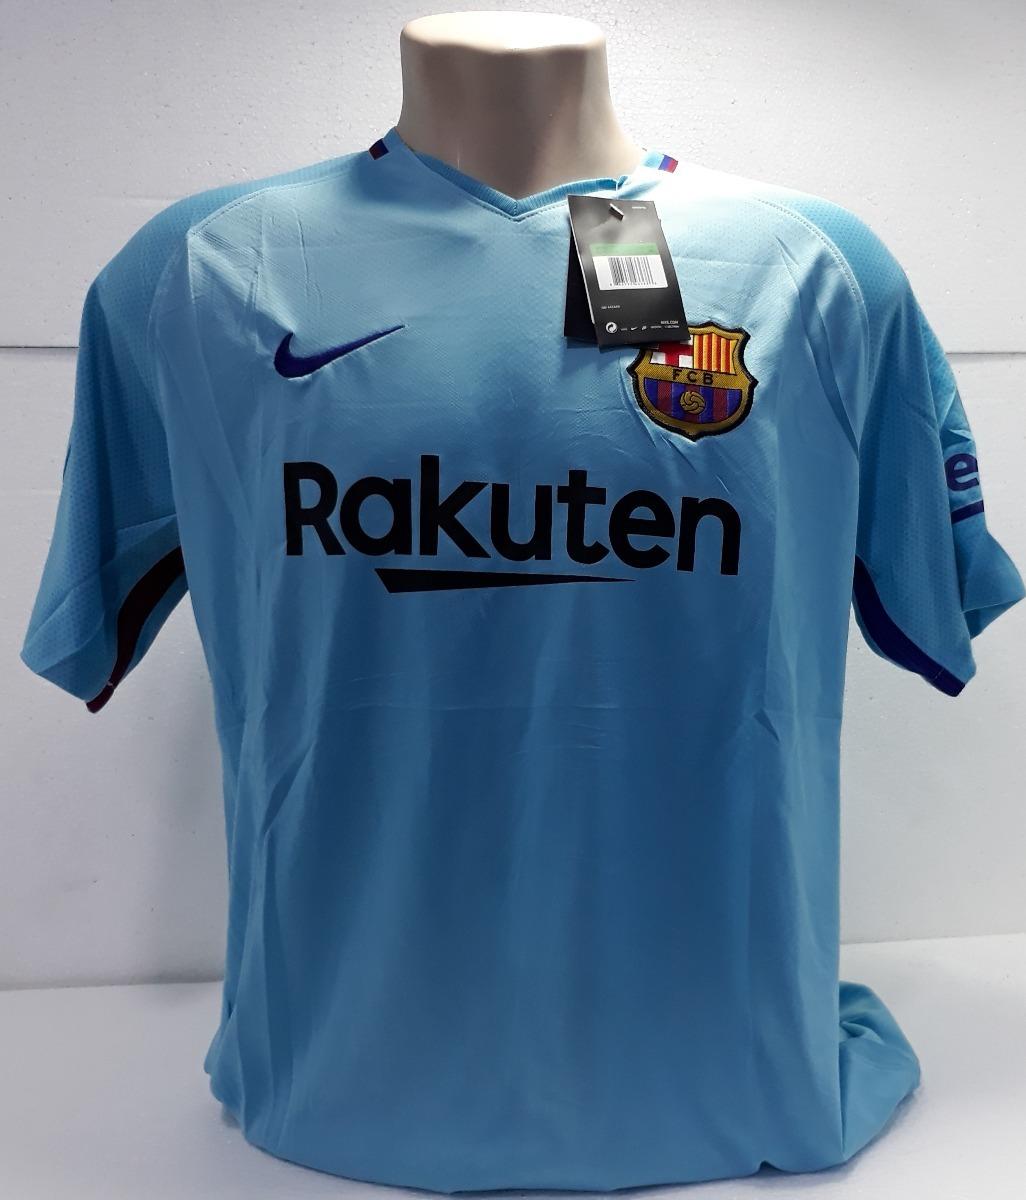 56bef971b6c56 camiseta futebol oficial barcelona azul personalizada. Carregando zoom.